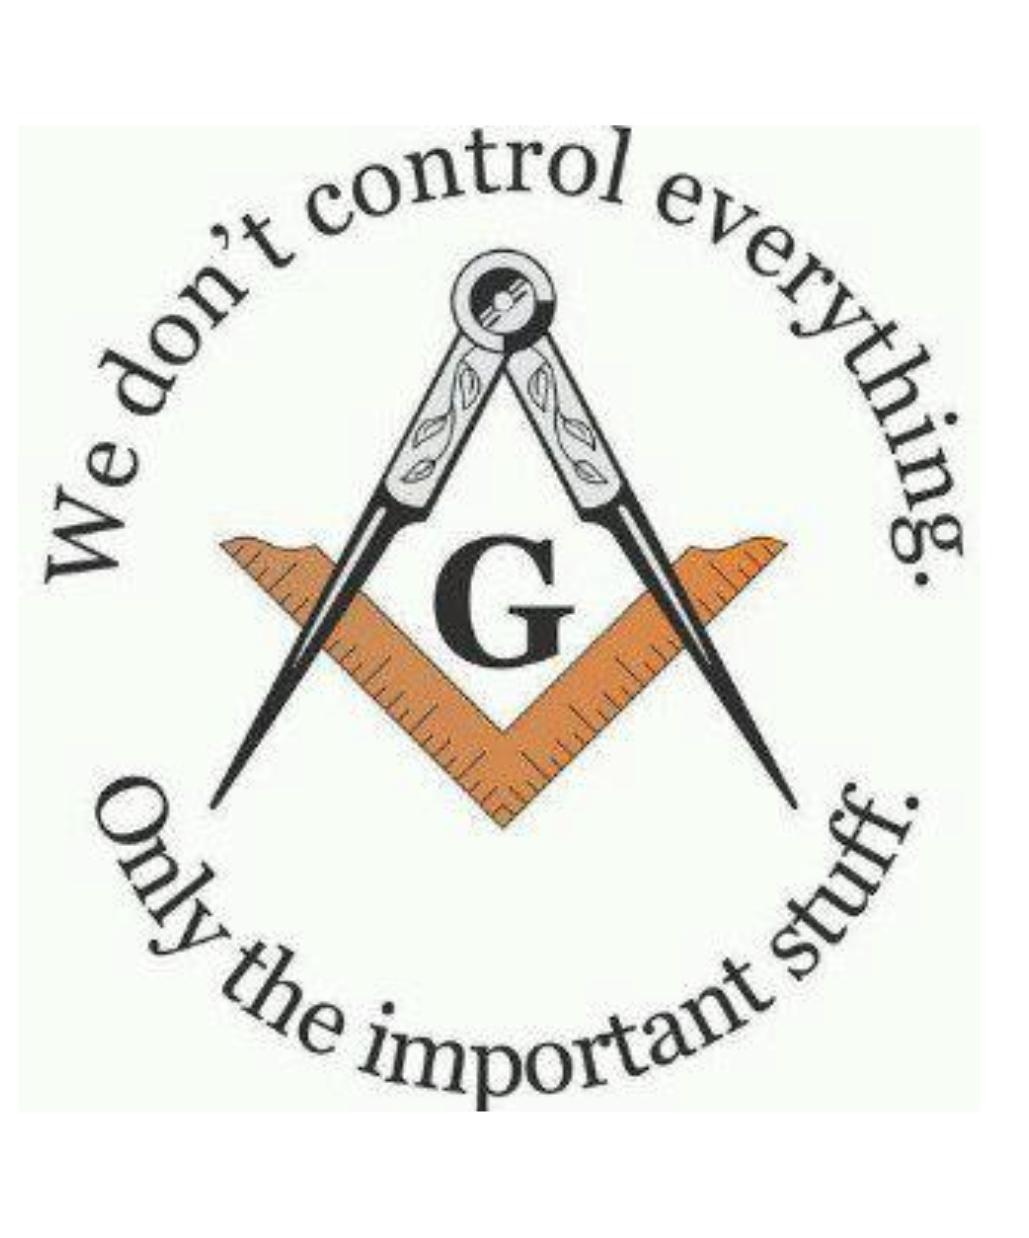 Pin by thatsclassified on secret societies pinterest yesa 3 rd degree freemason pronofoot35fo Images